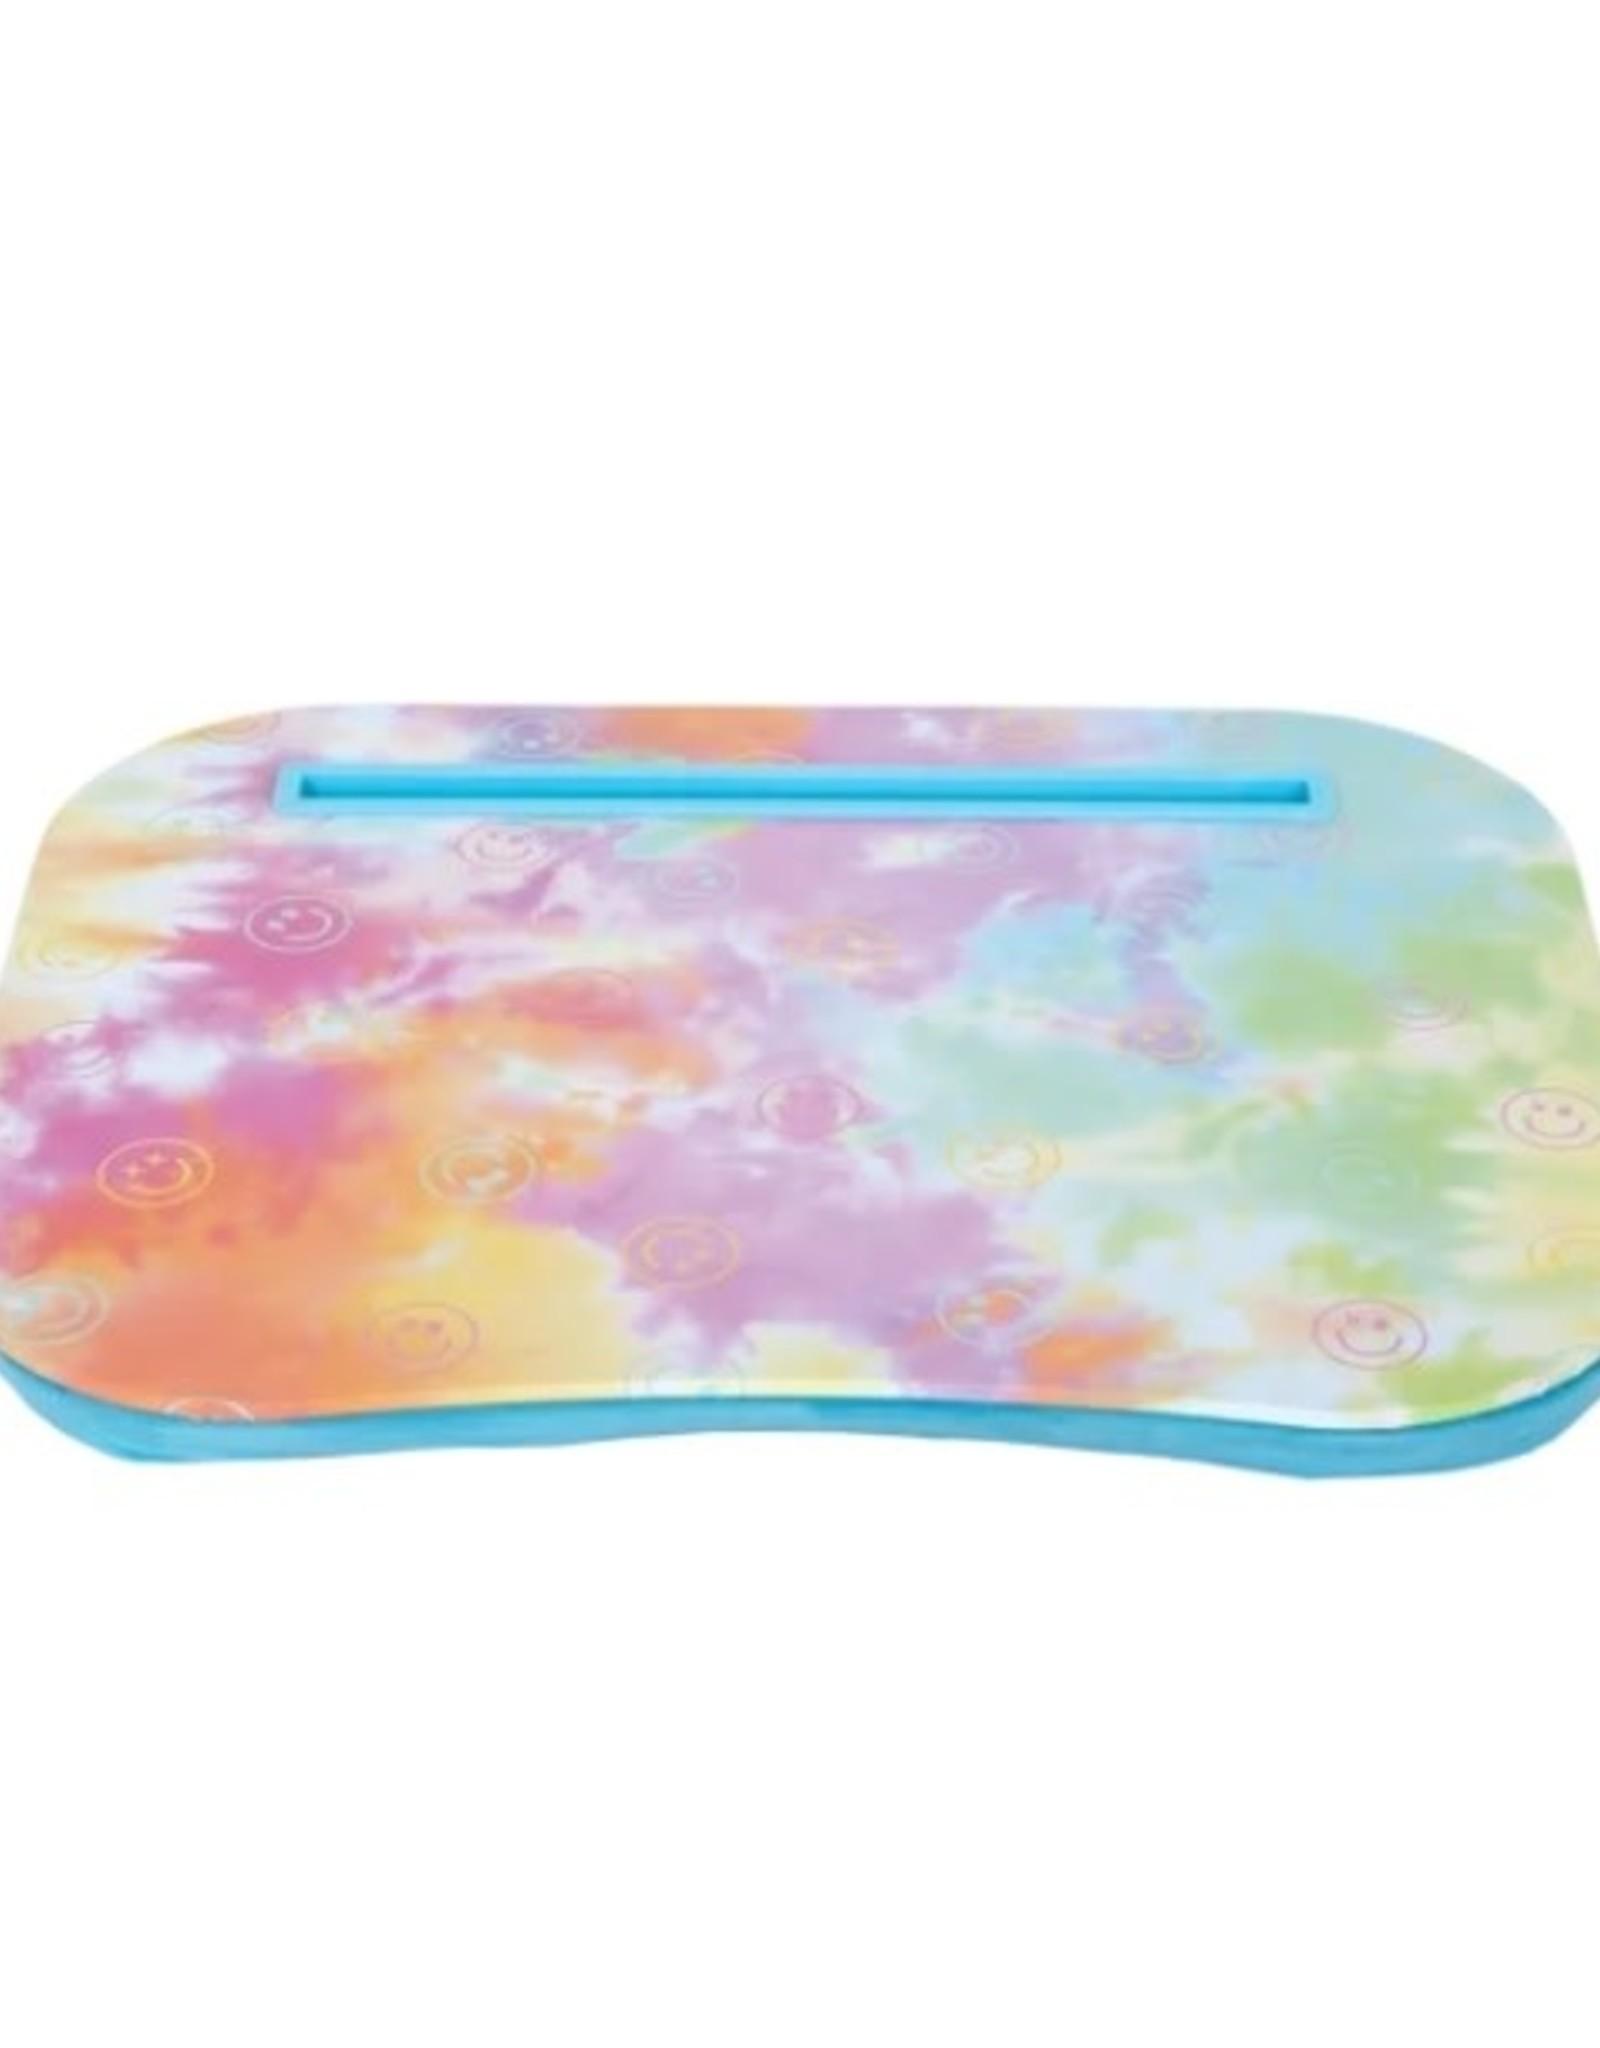 Iscream Cotton Candy Lap Desk